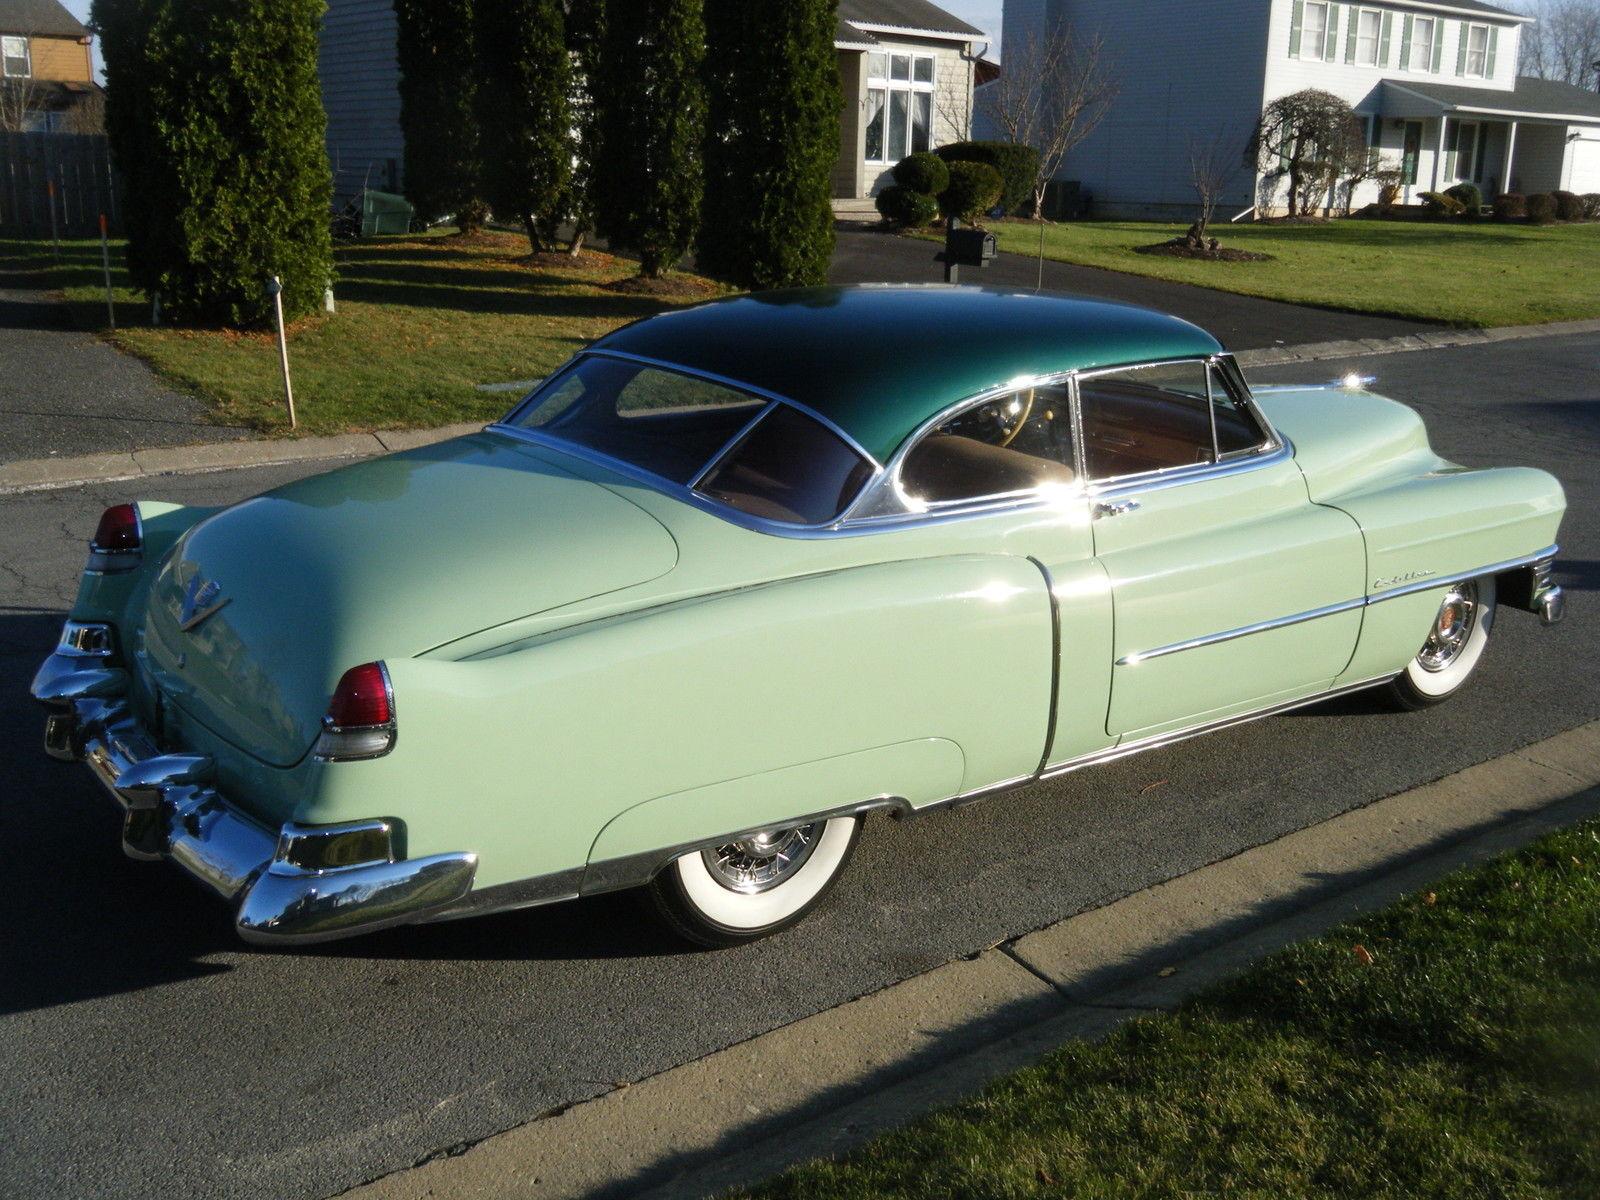 1951 Cadillac Coupe Very Rare Original Time Capsule